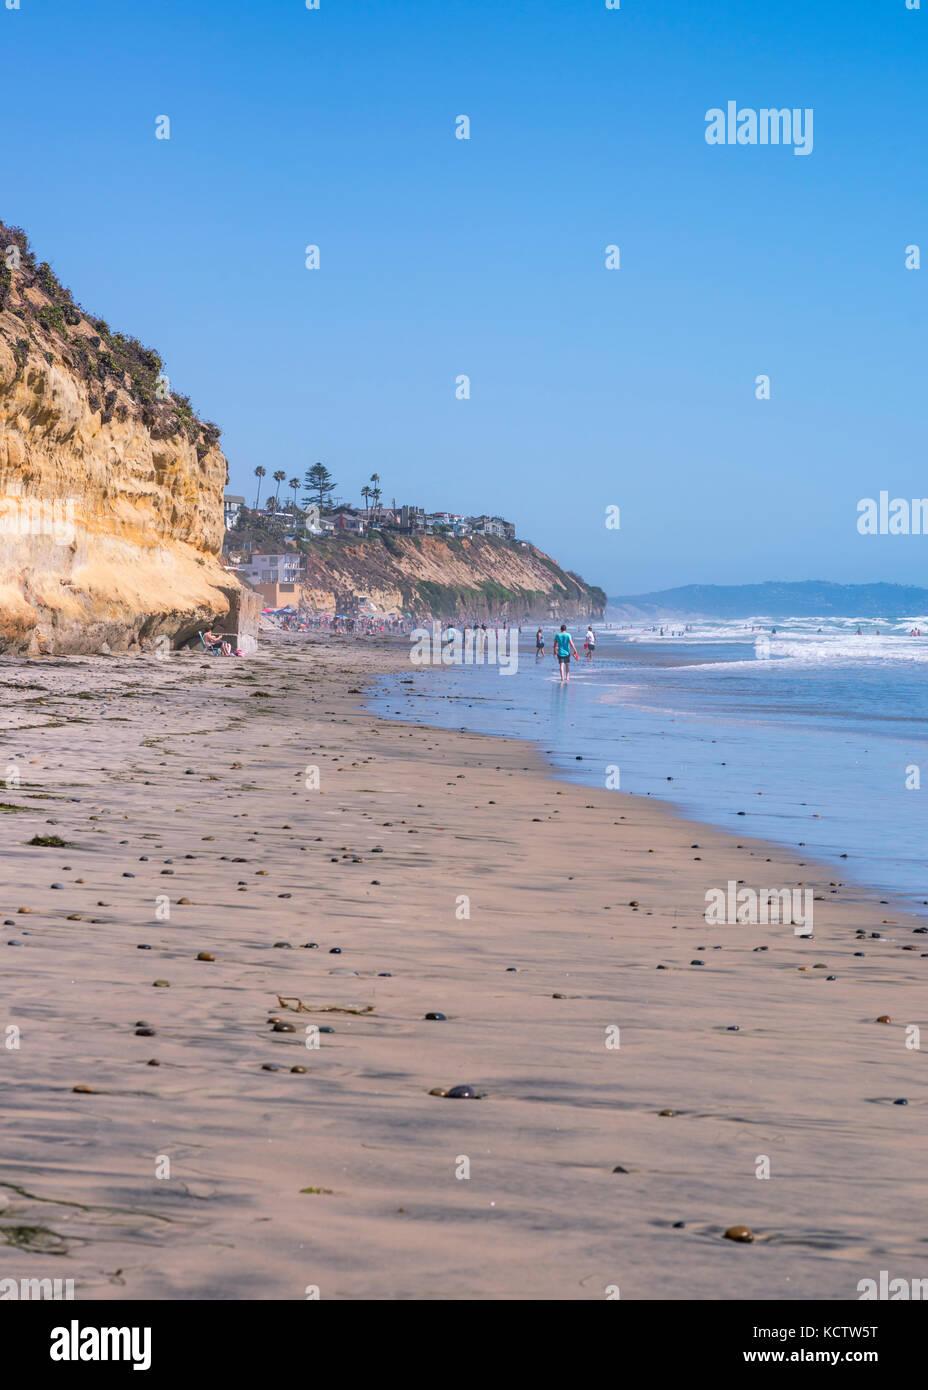 Stone Steps Beach looking south. Encinitas, California, USA. - Stock Image